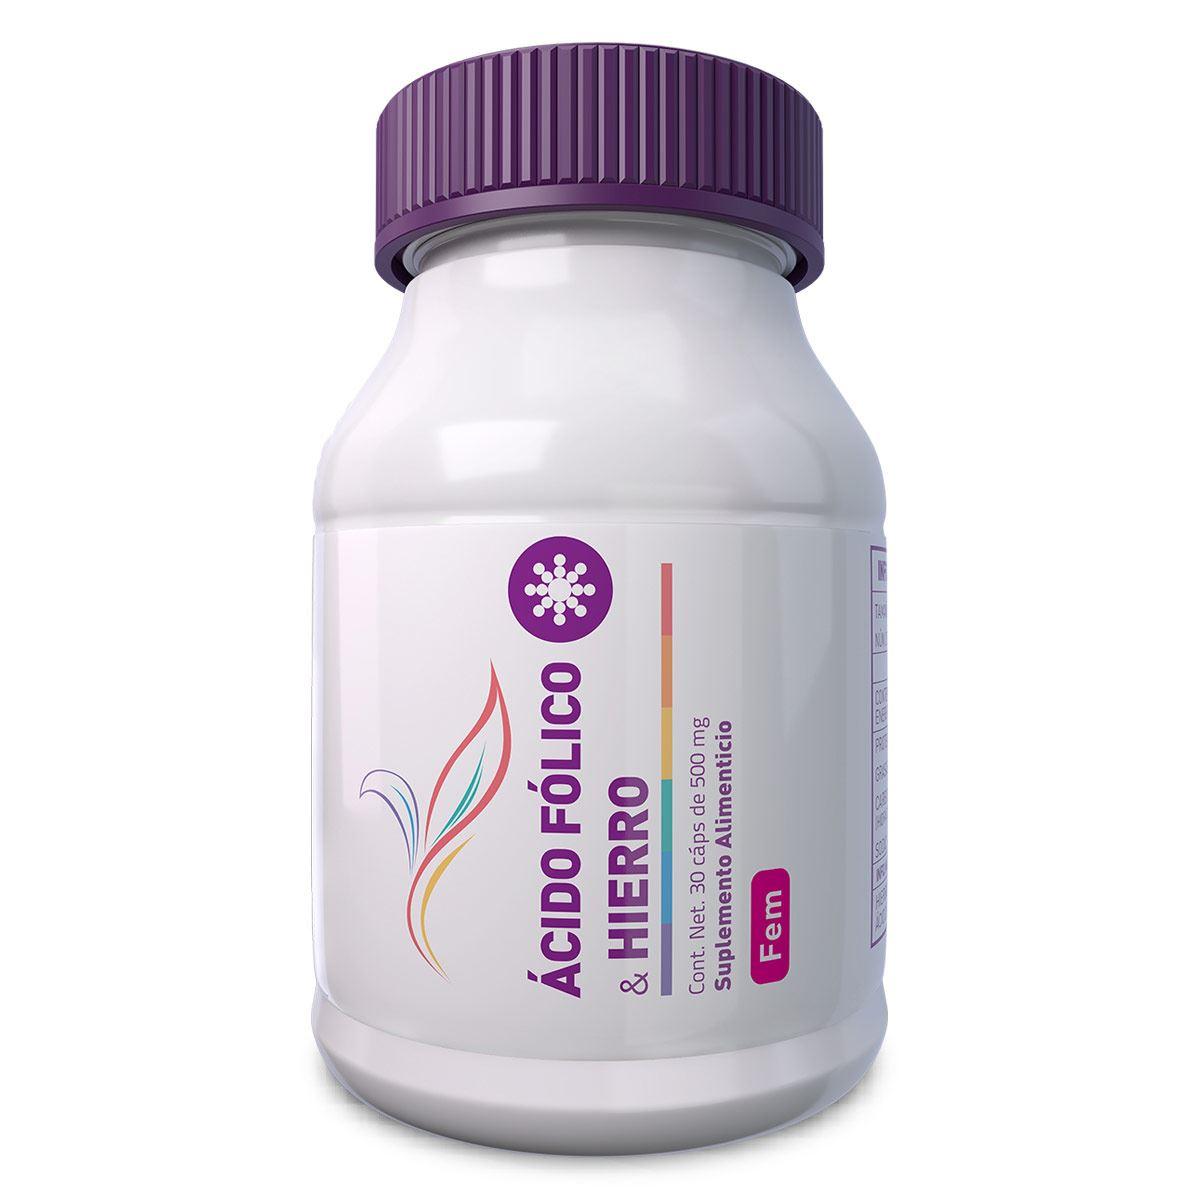 Suplemento Ácido Folico & Hierro 30 Cápsulas 500 mg Essential Nutrition